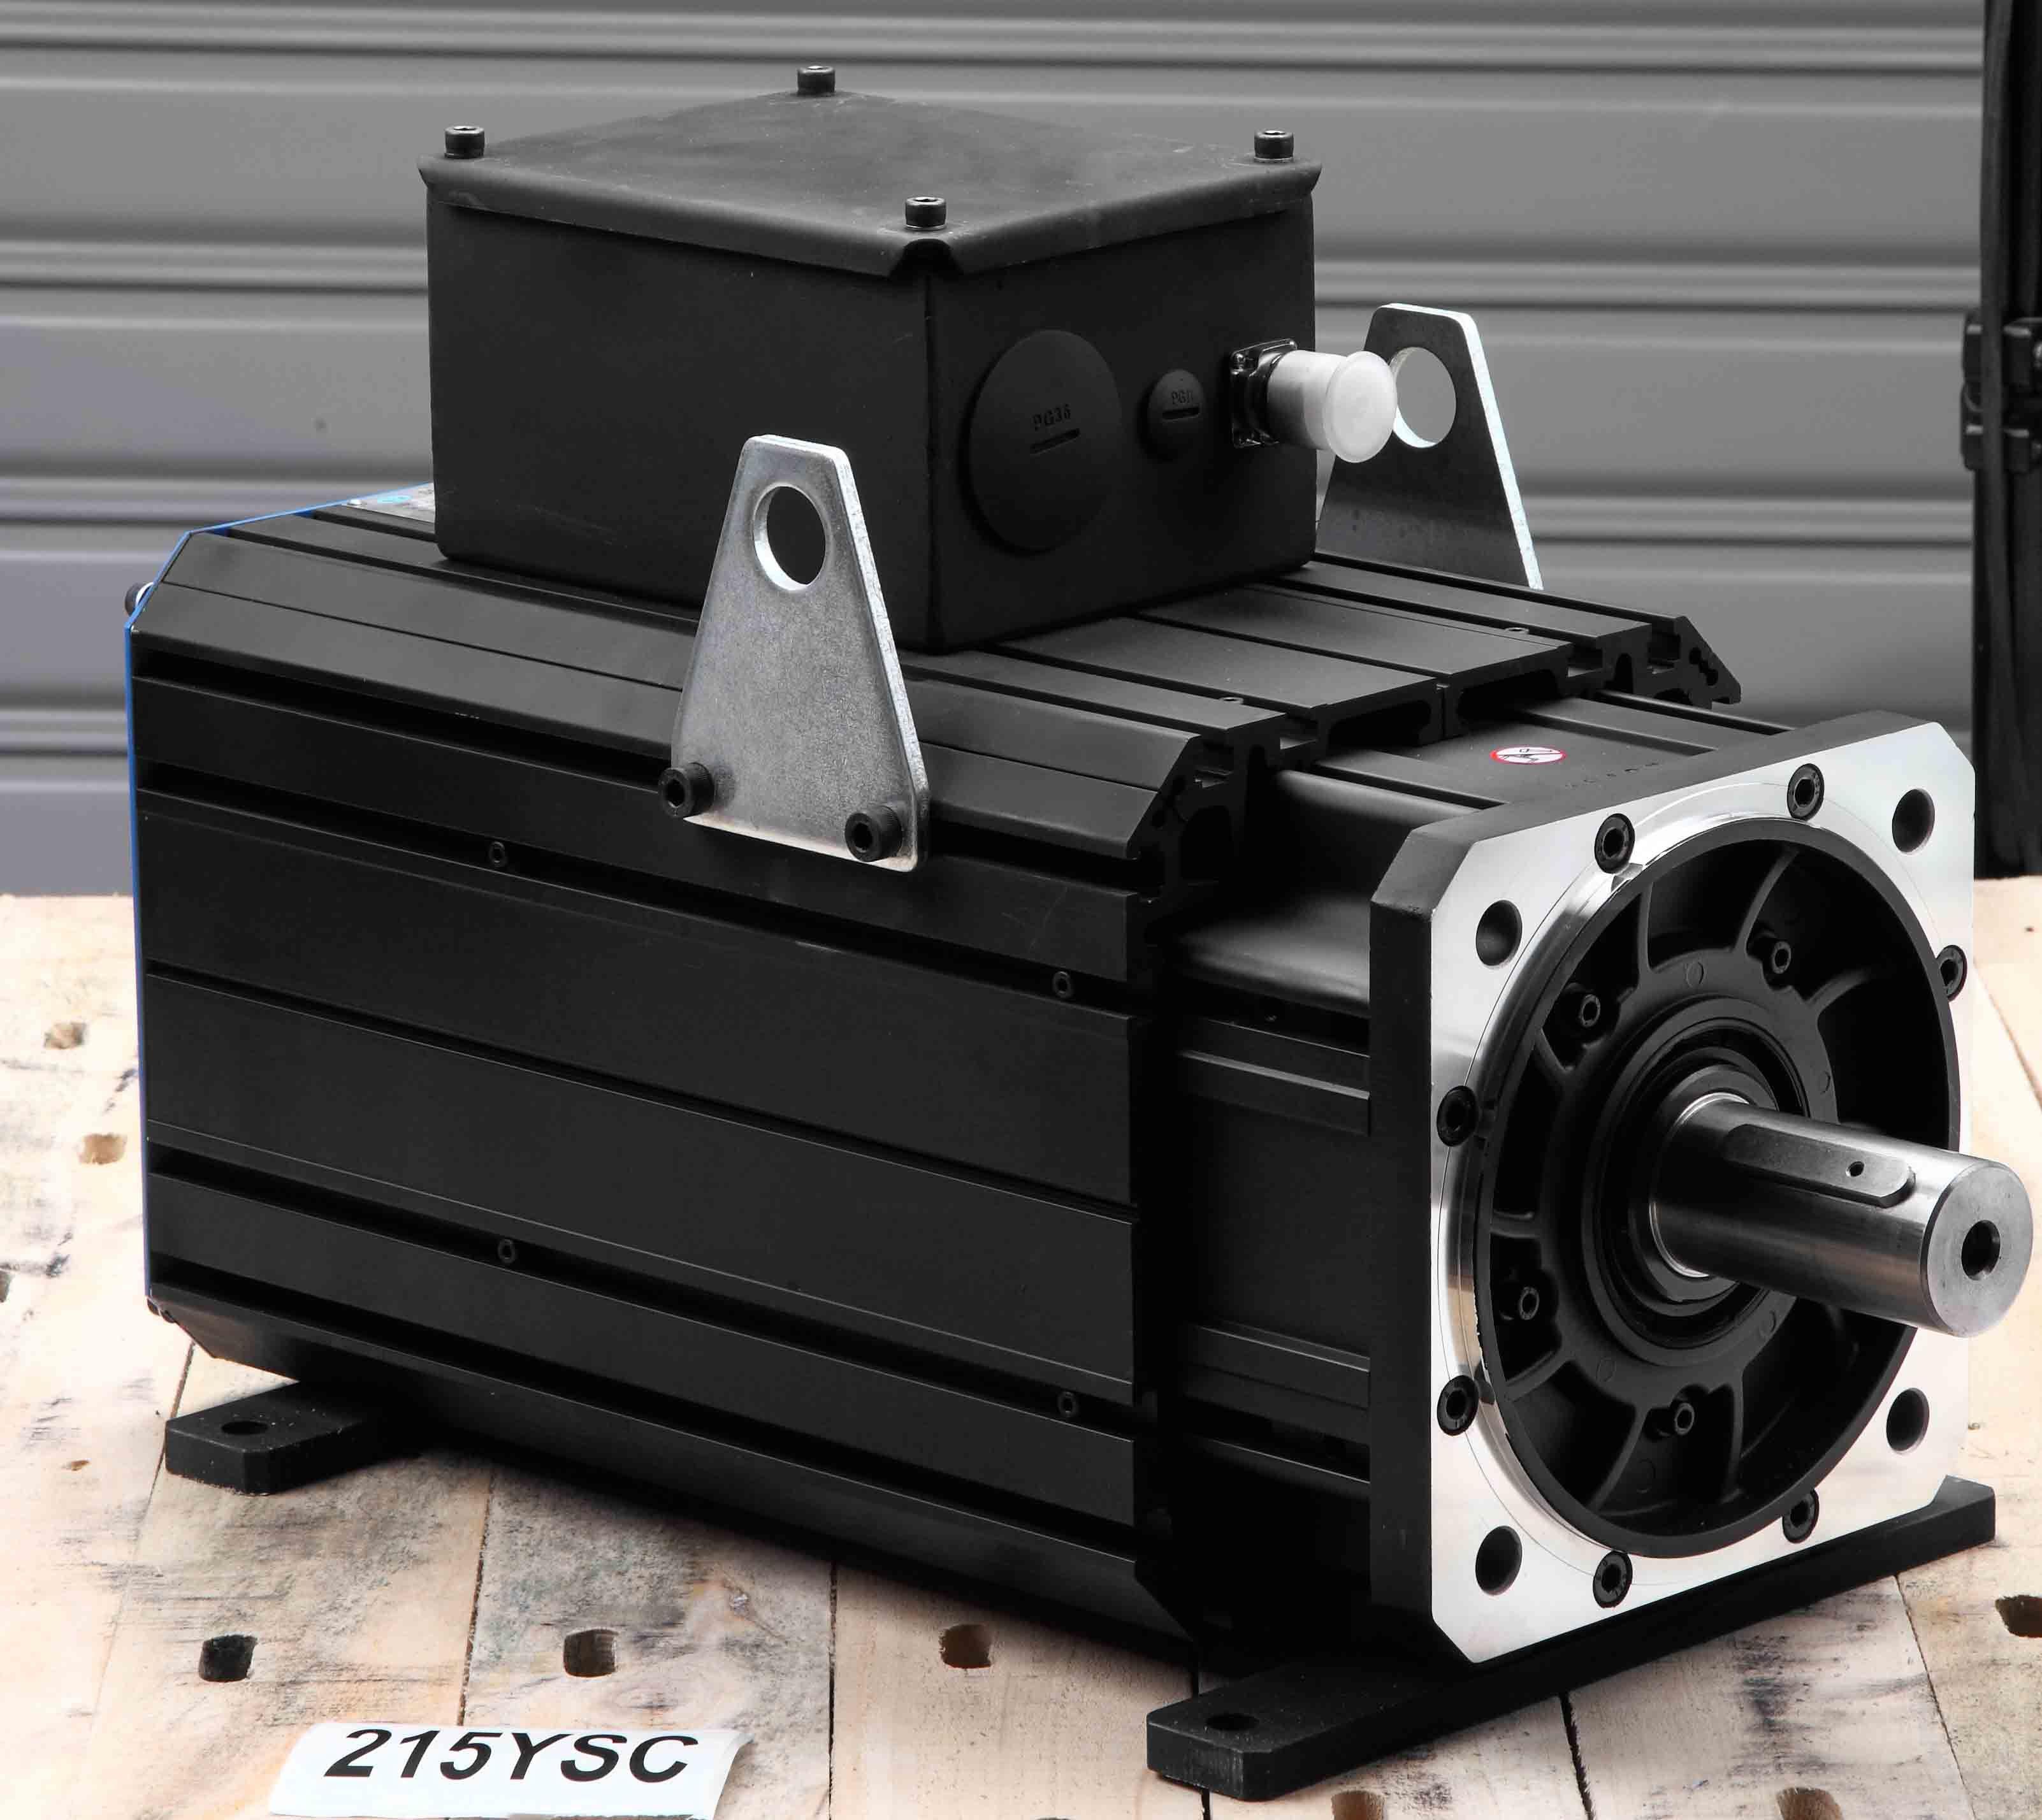 AC Permanent Magnet Servo Motor 215ysc20f 105nm 2000rpm